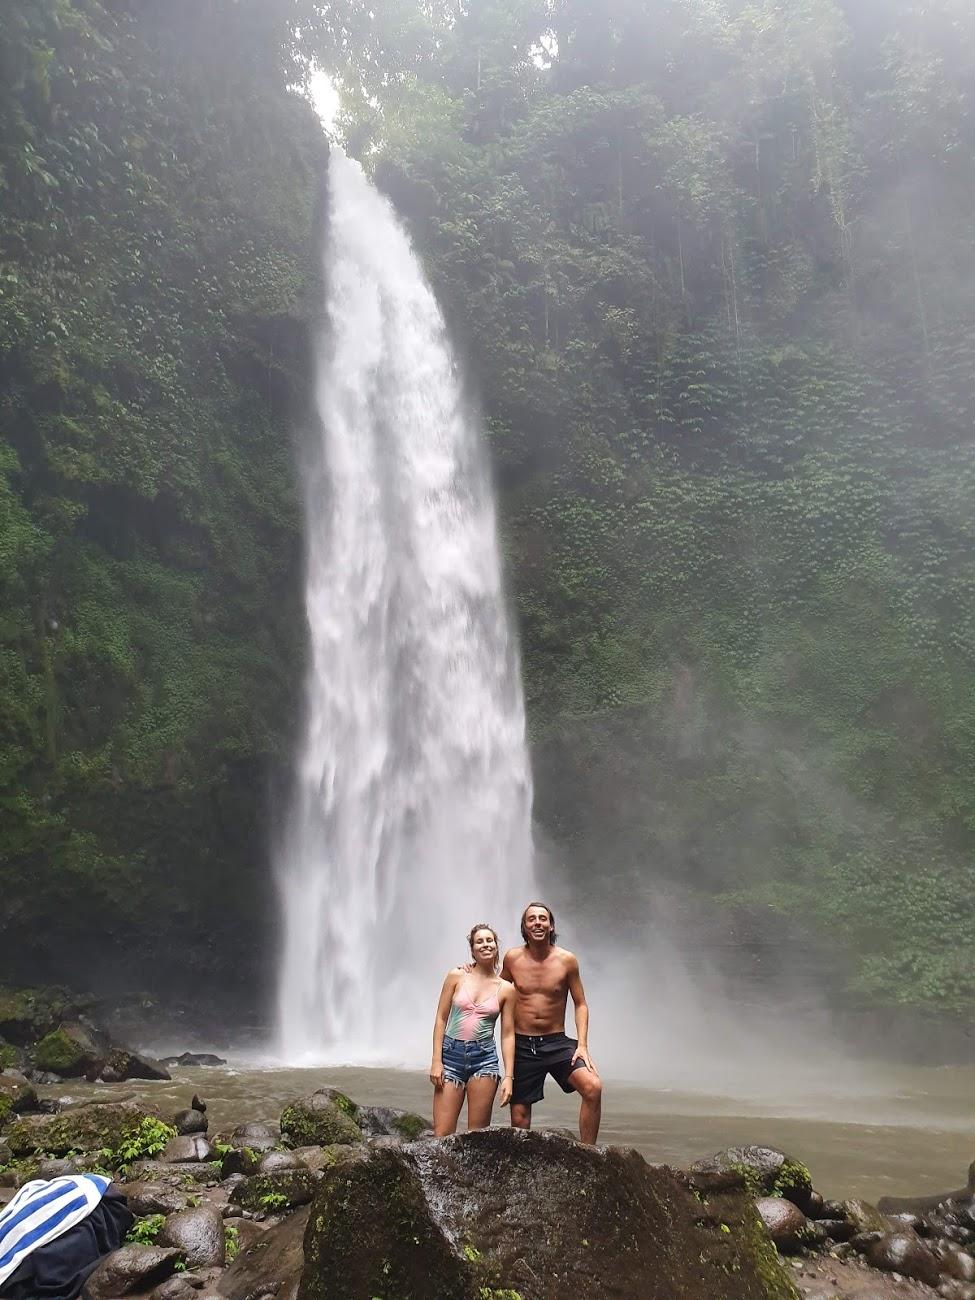 Nung Nung Waterfall